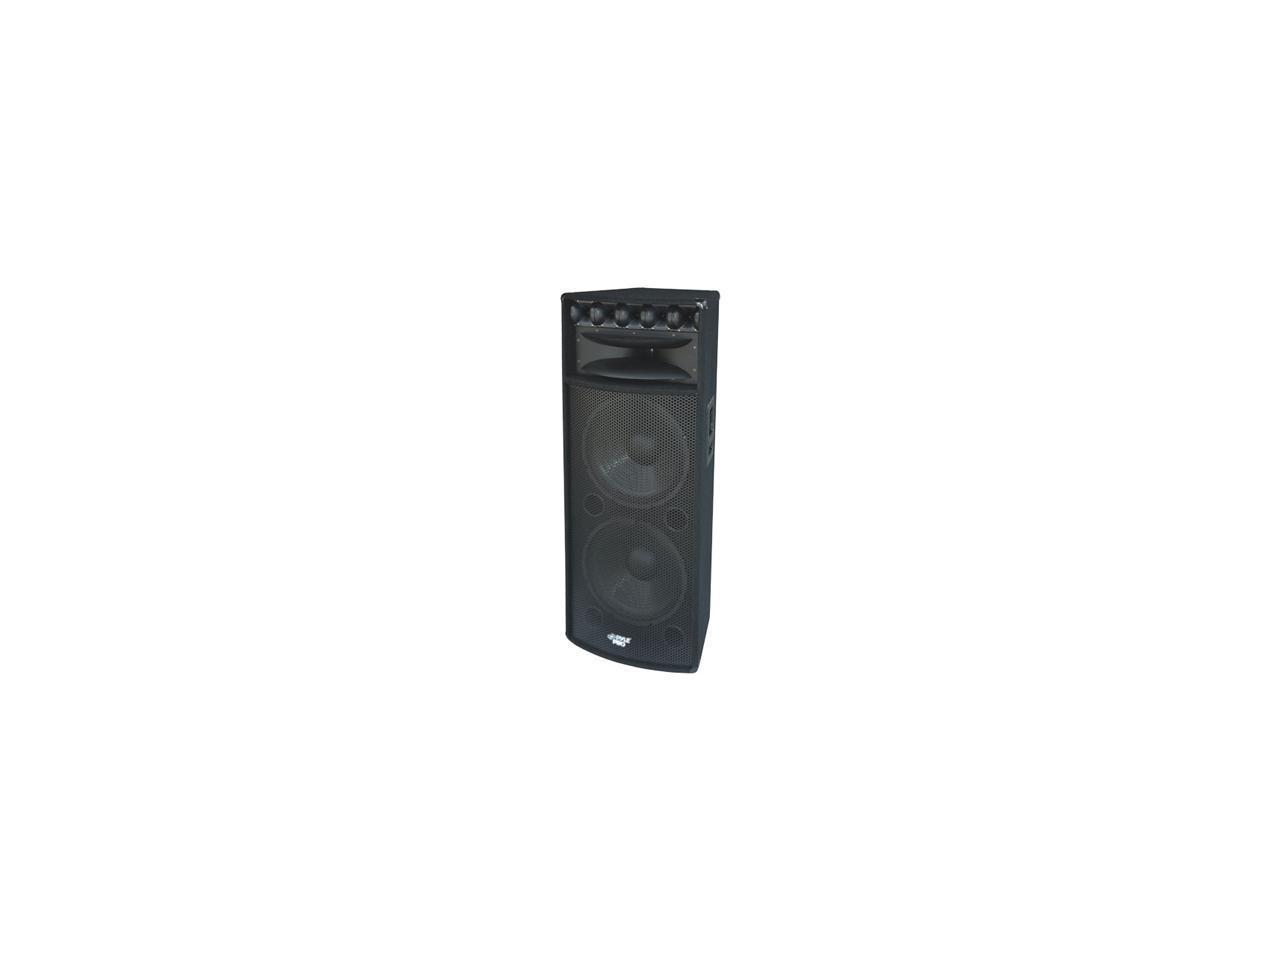 Pyle Padh215 21 U0026 39  U0026 39  2000 Watts Pa Speaker Cabinet Single